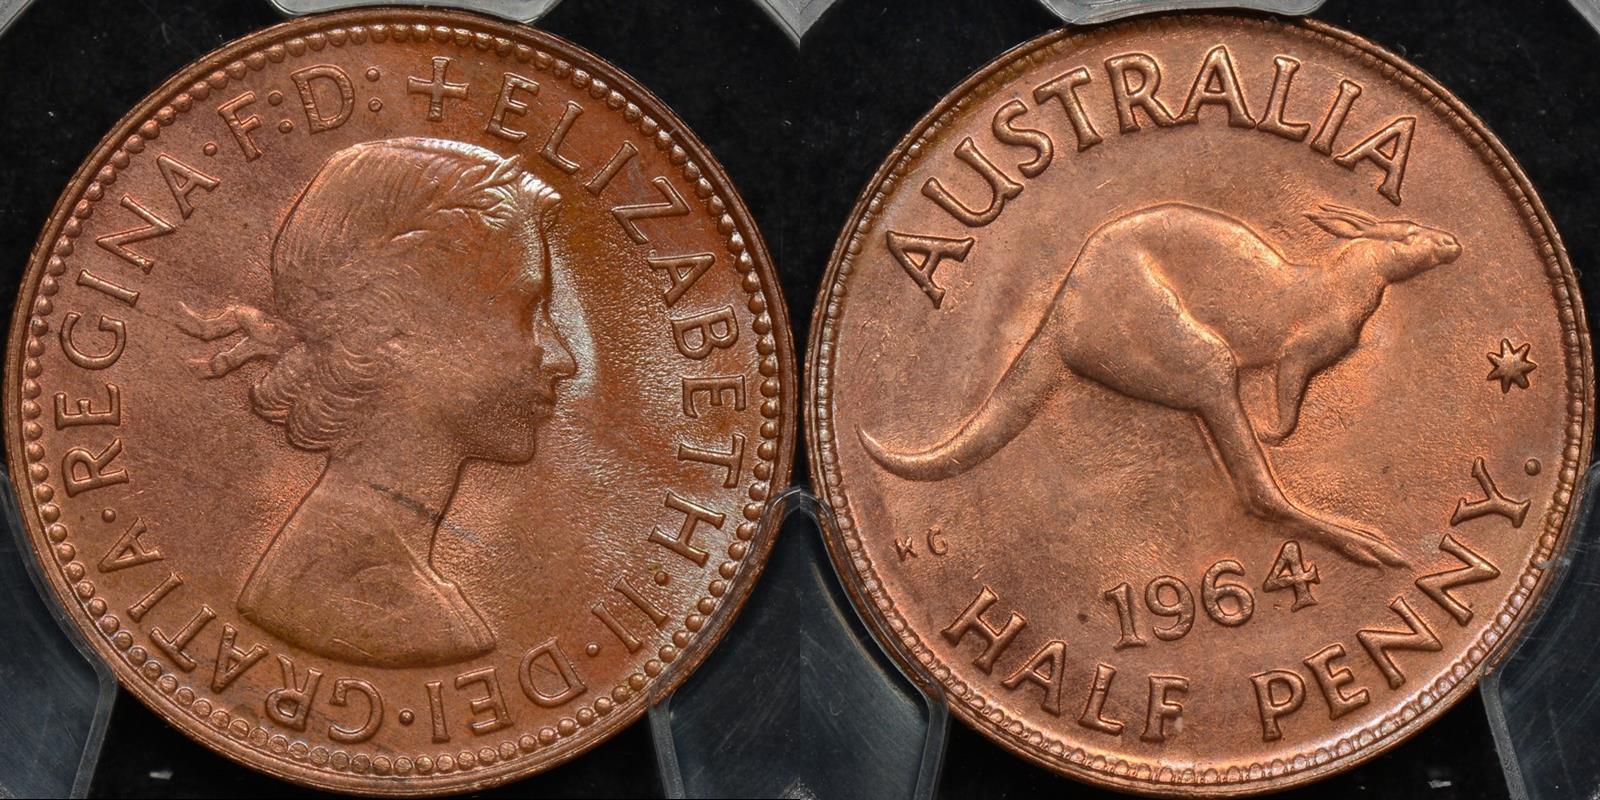 Australia 1964y halfpenny 1 2d Choice Uncirculated PCGS MS64rb